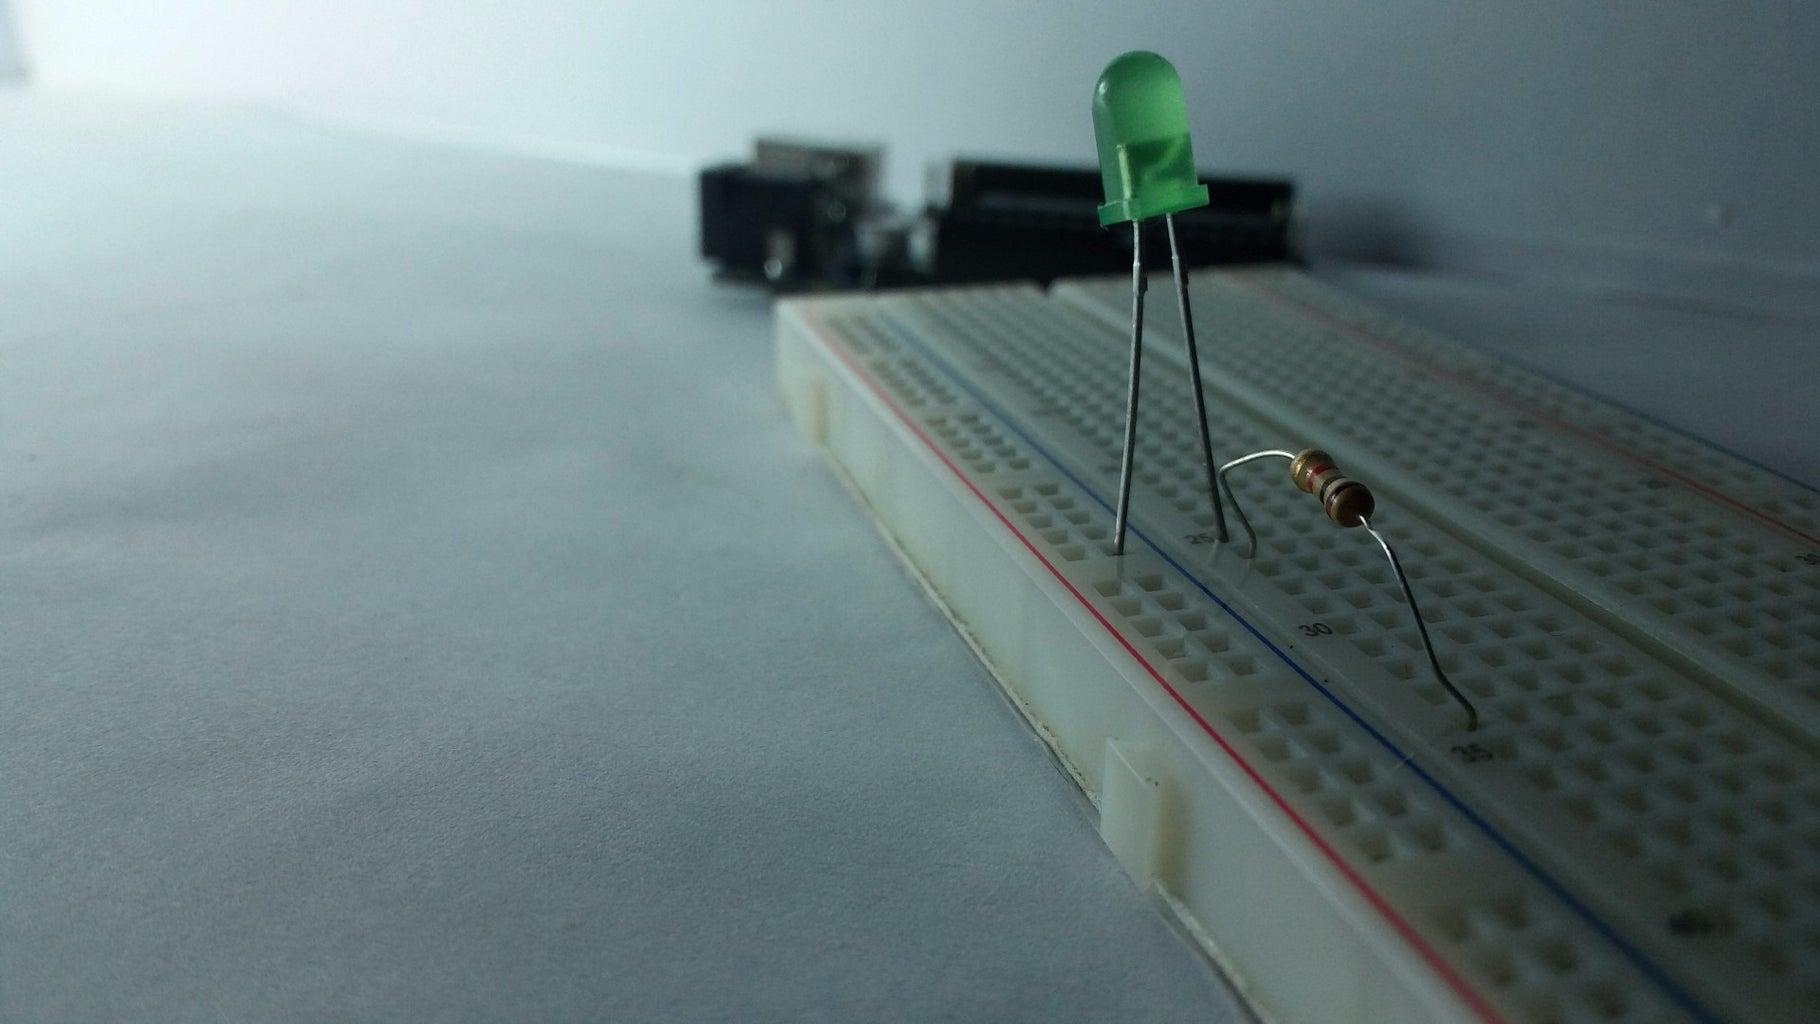 BUILDING ELECTRONICS :-